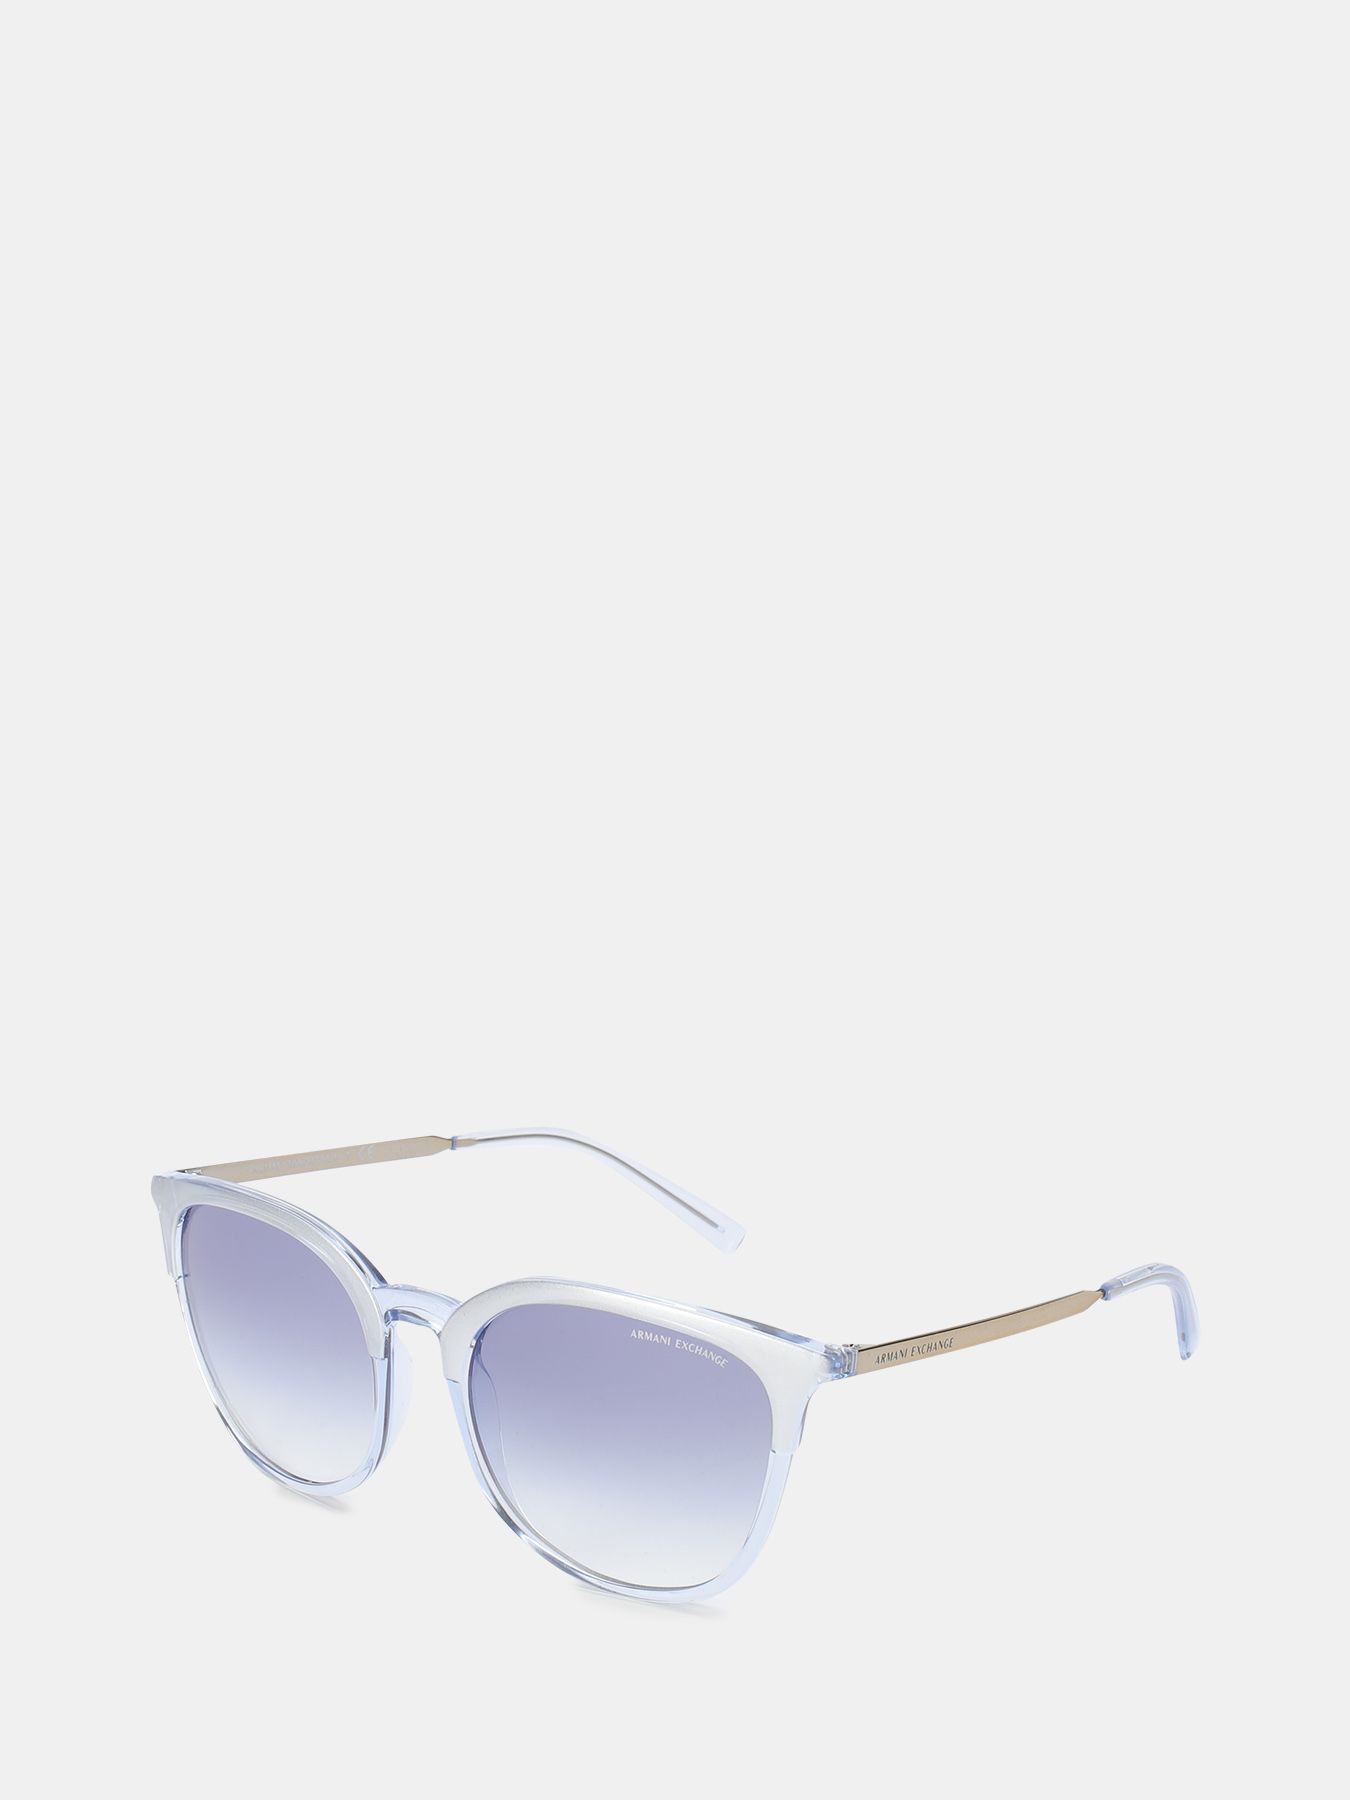 цена на Очки Armani Exchange Солнцезащитные очки